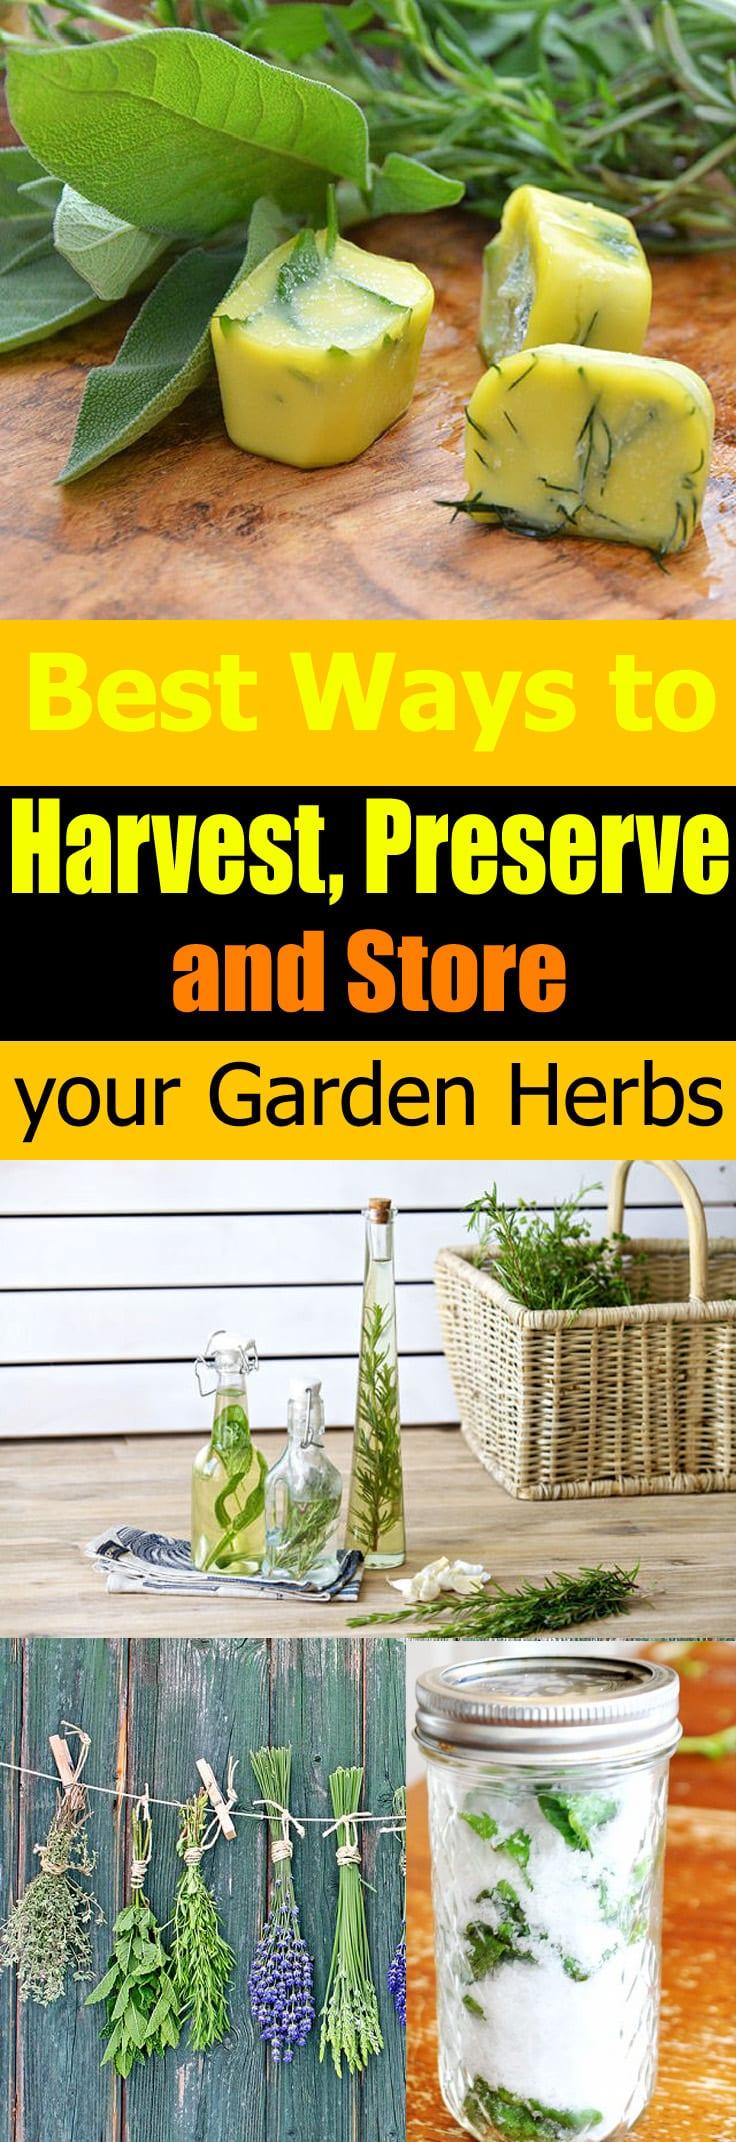 best ways to harvest preserve store your garden herbs balcony garden web. Black Bedroom Furniture Sets. Home Design Ideas